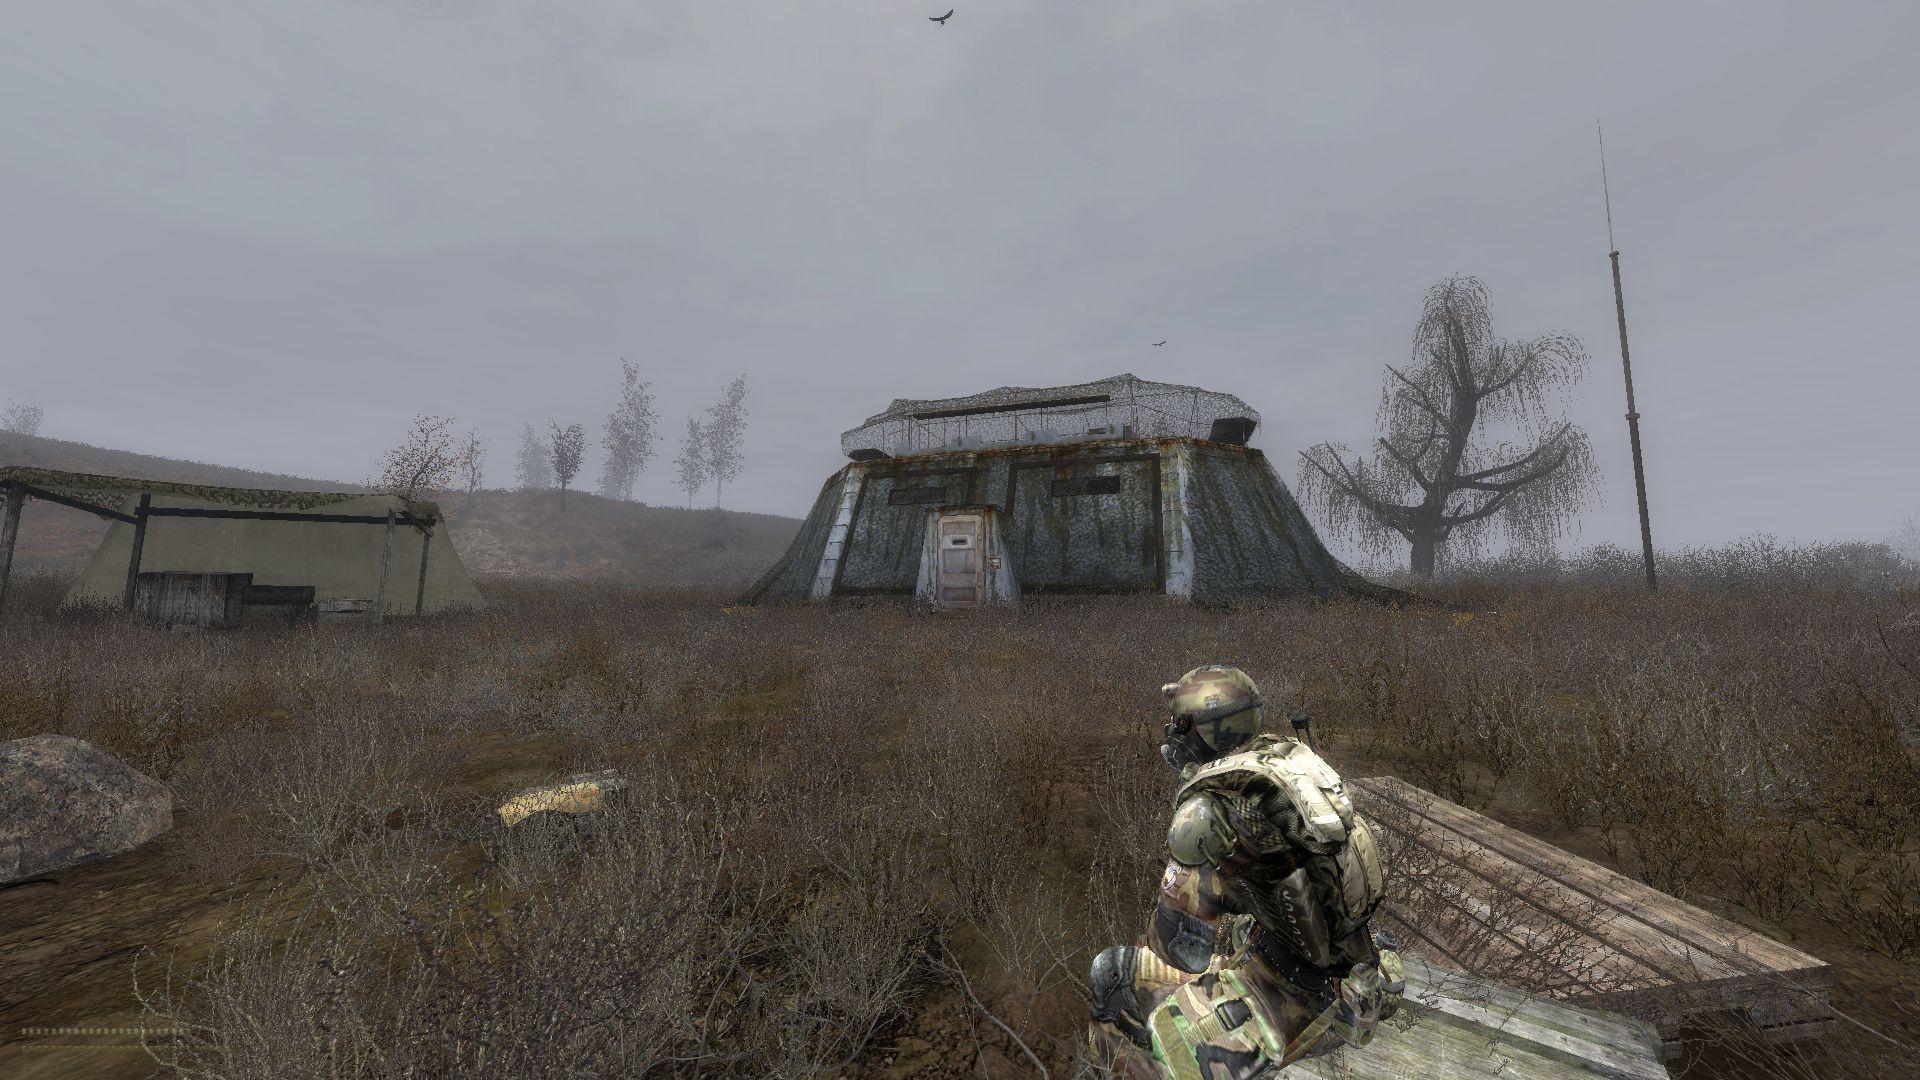 00008.Jpg - S.T.A.L.K.E.R.: Call of Pripyat